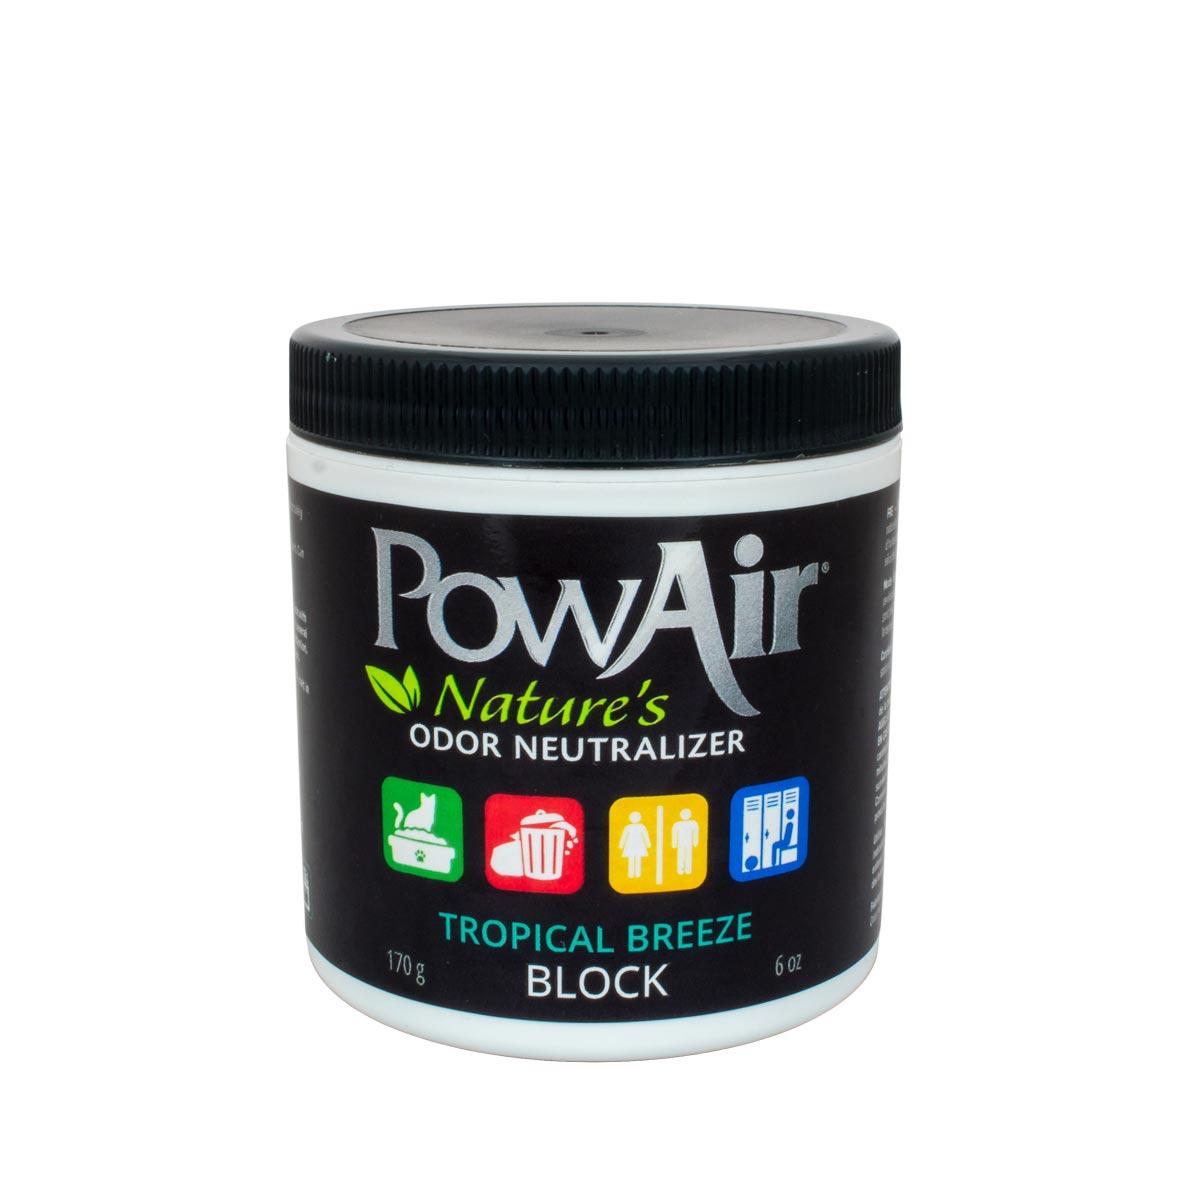 powair block tropical breeze 170g